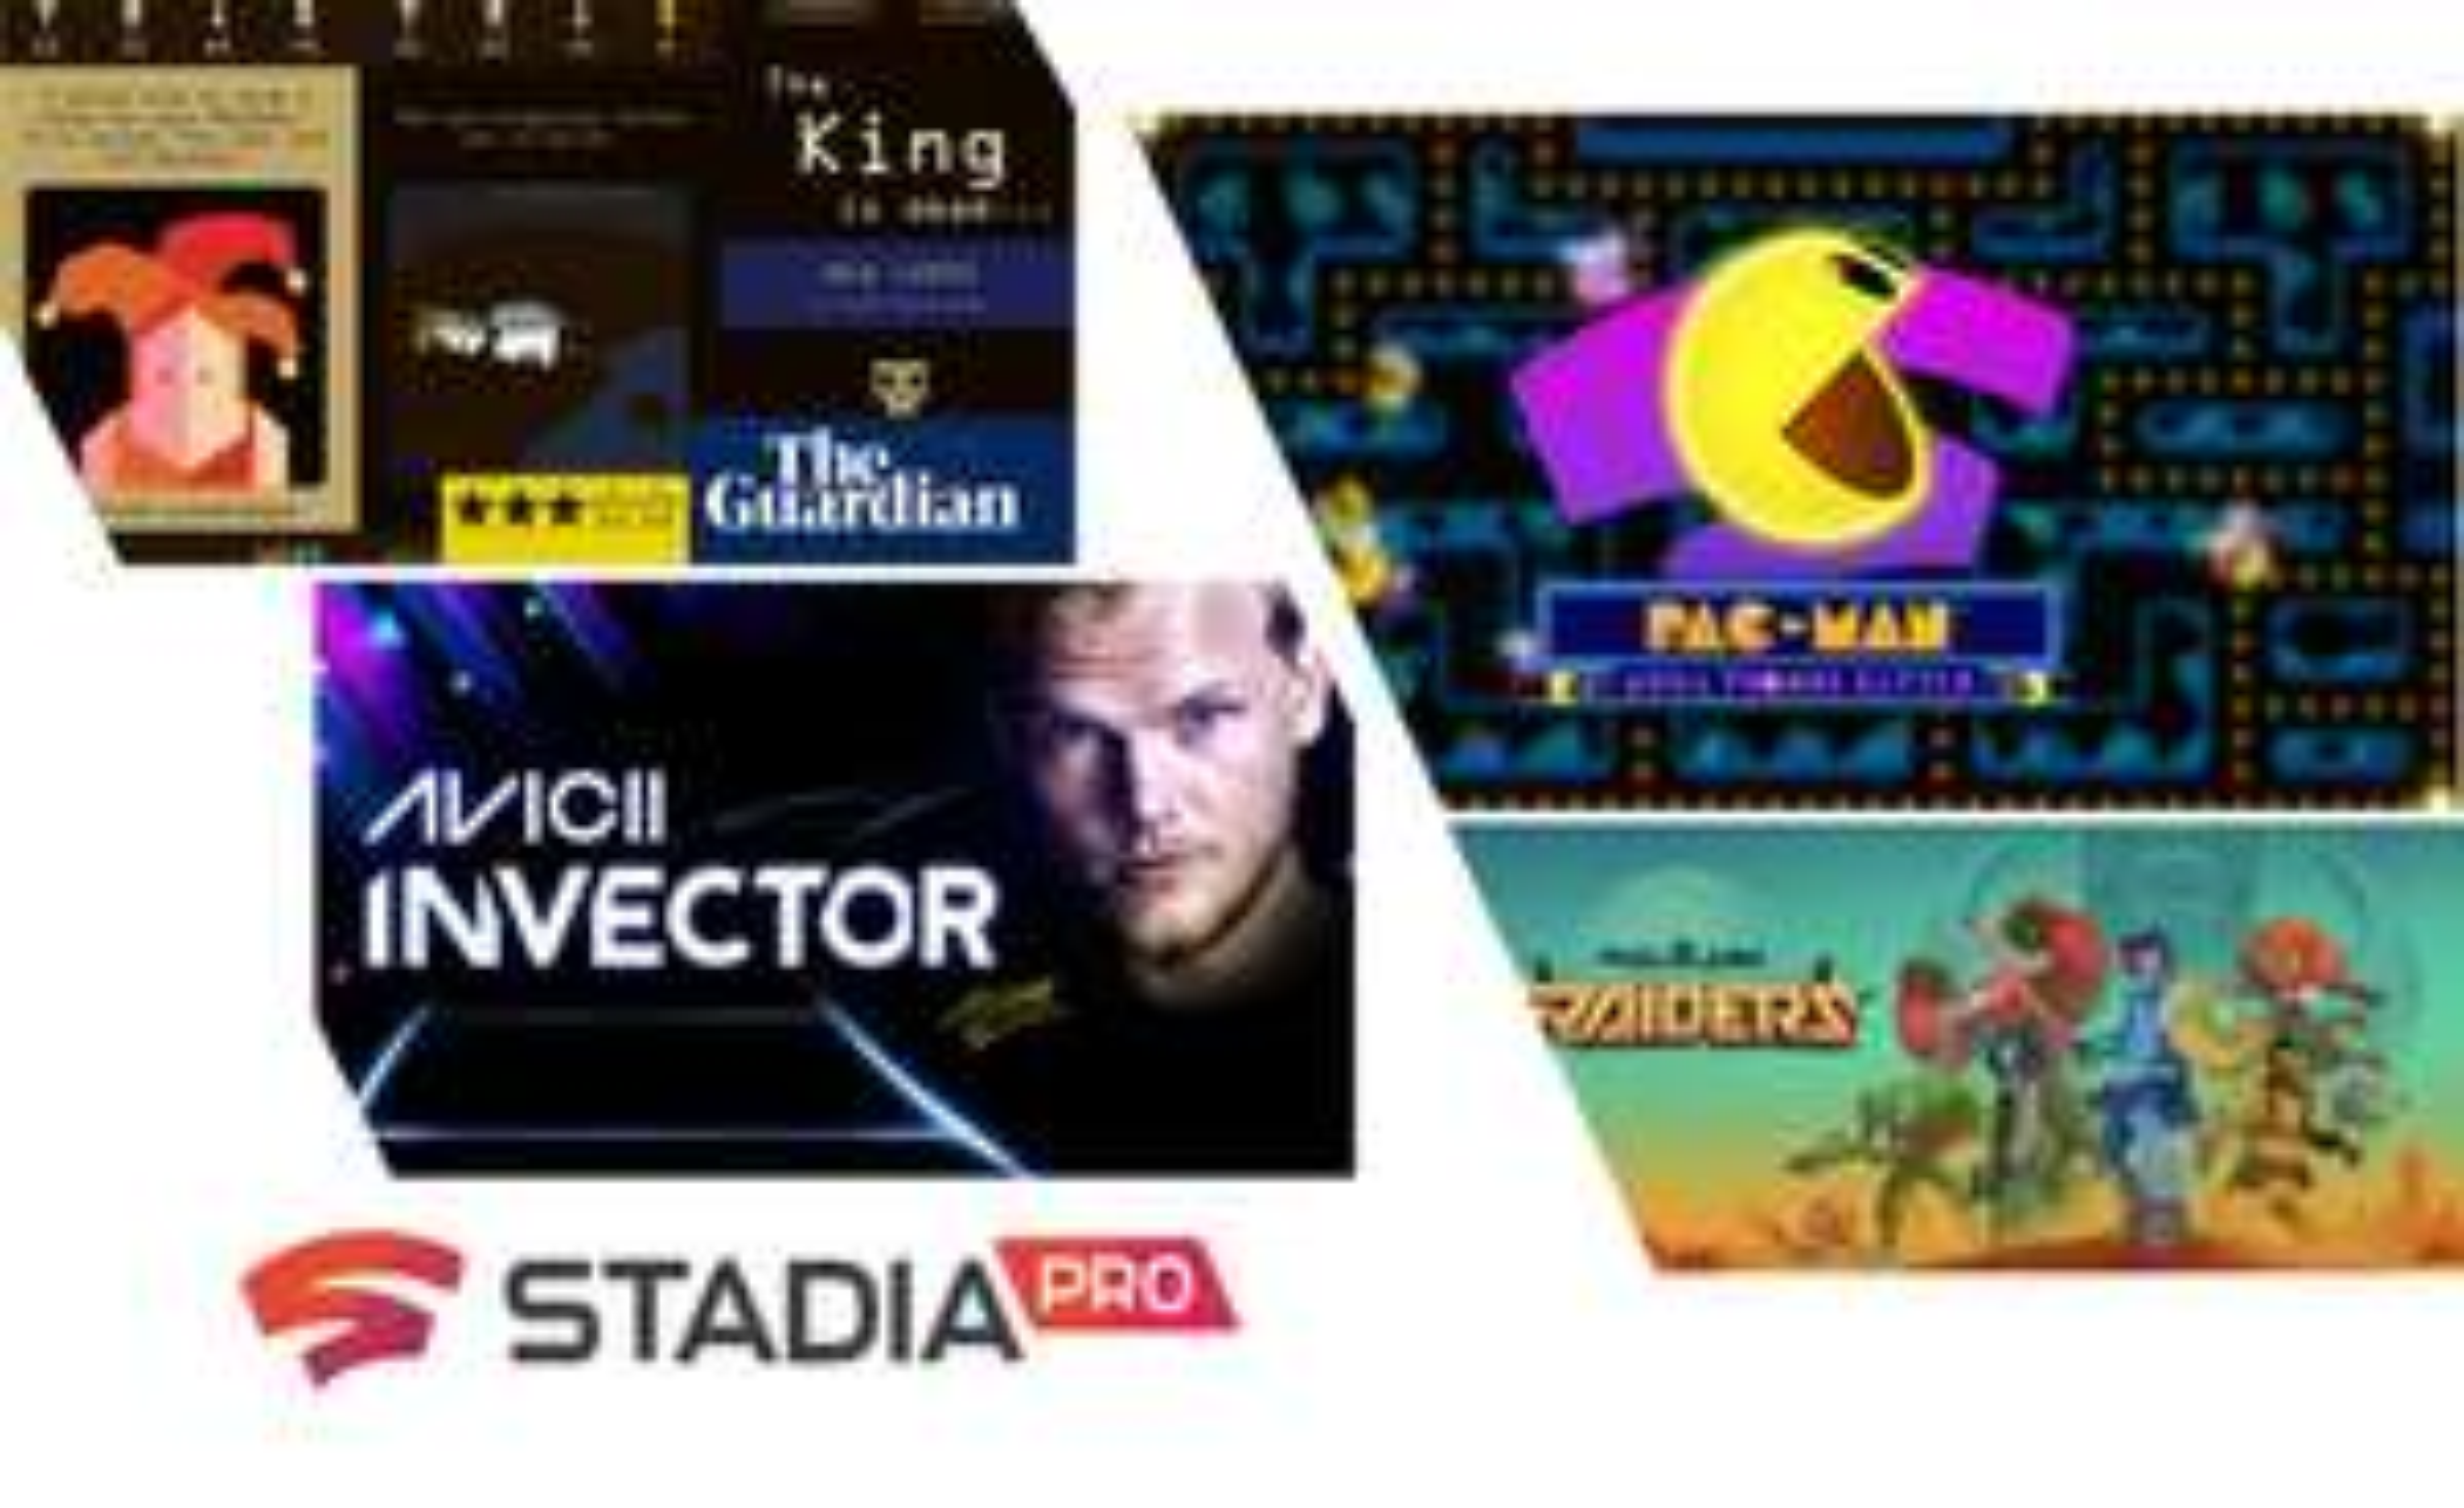 [Stadia Pro] März free Games: PixelJunk Raiders, AVICII, PAC-MAN Mega Tunnel Battle, Reigns